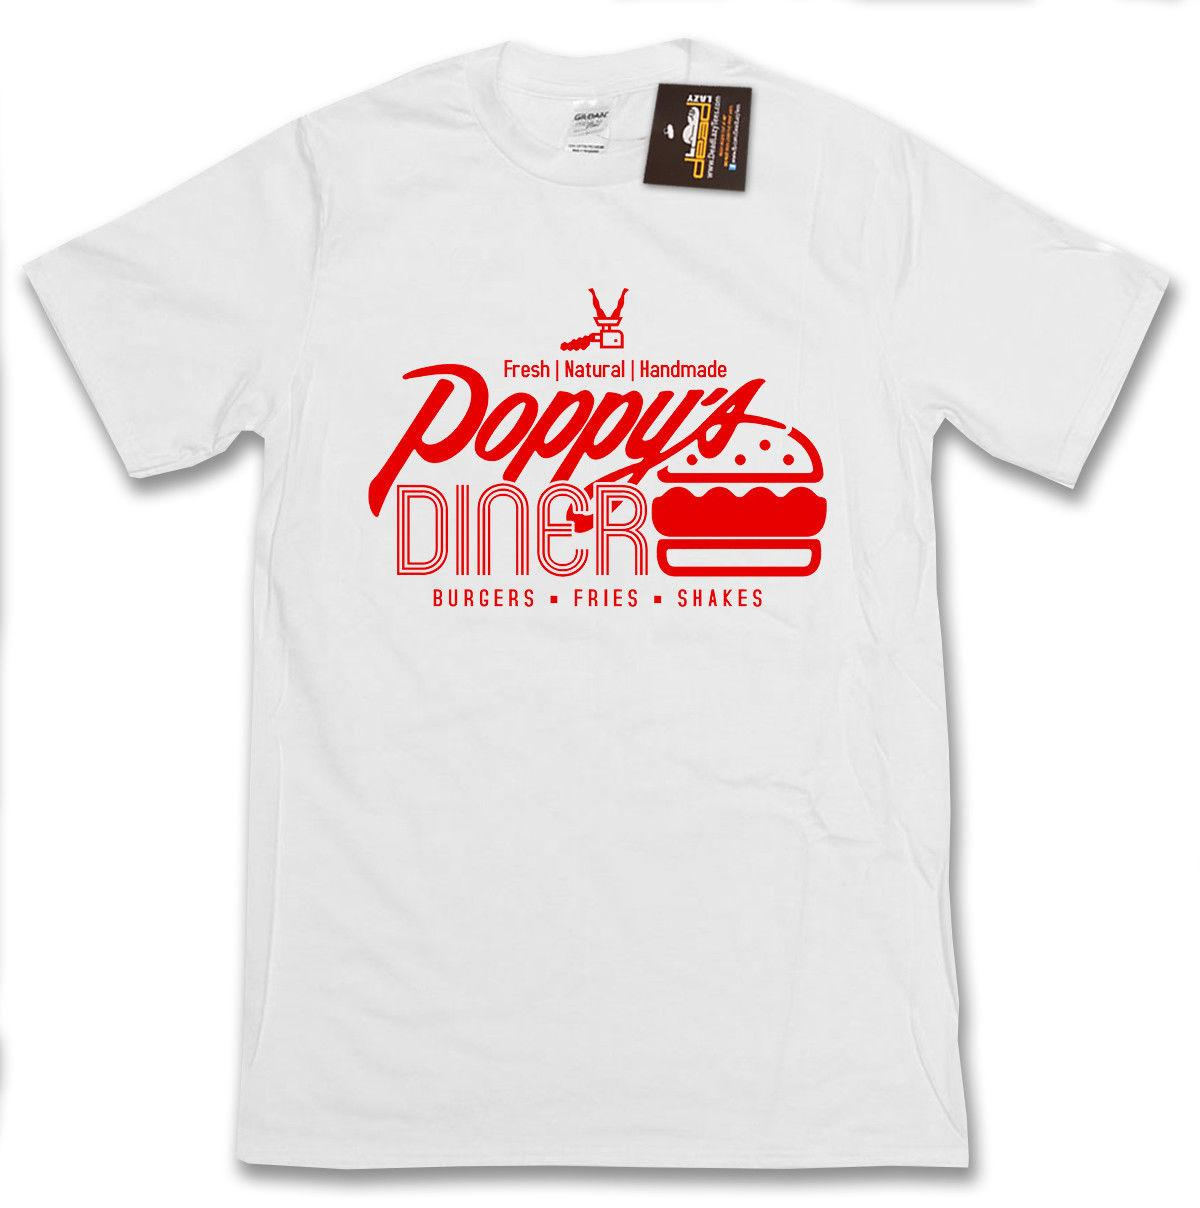 39c440215 Kingsman: The Golden Circle Inspired Poppy'S Diner T Shirt British Action  FilmFunny Unisex Tshirt The T Shirt T Shirts Designer From Tshirtbakers, ...